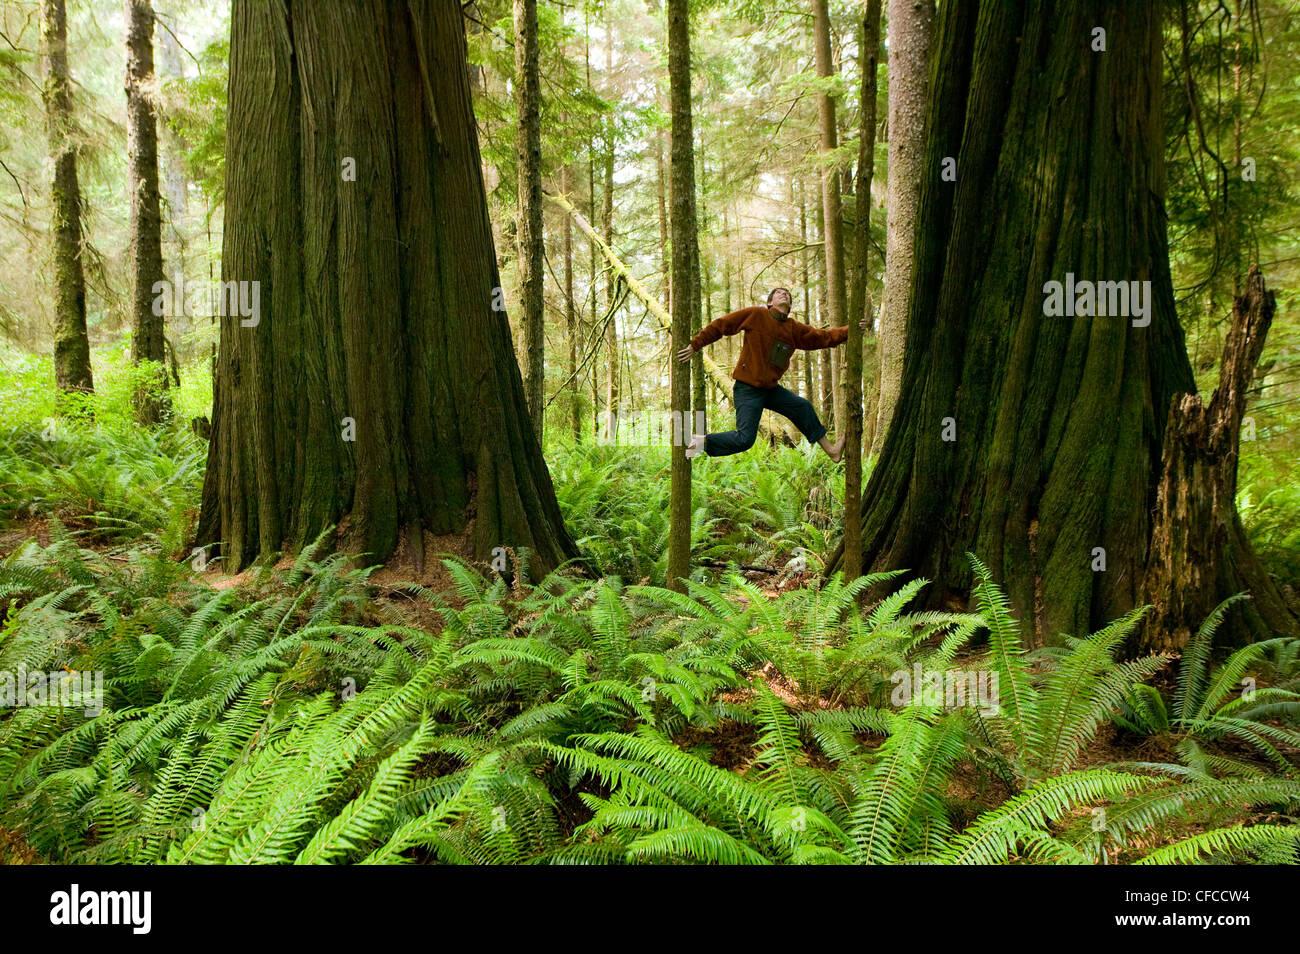 Two giant Cedar trees frame this agile climber - Stock Image